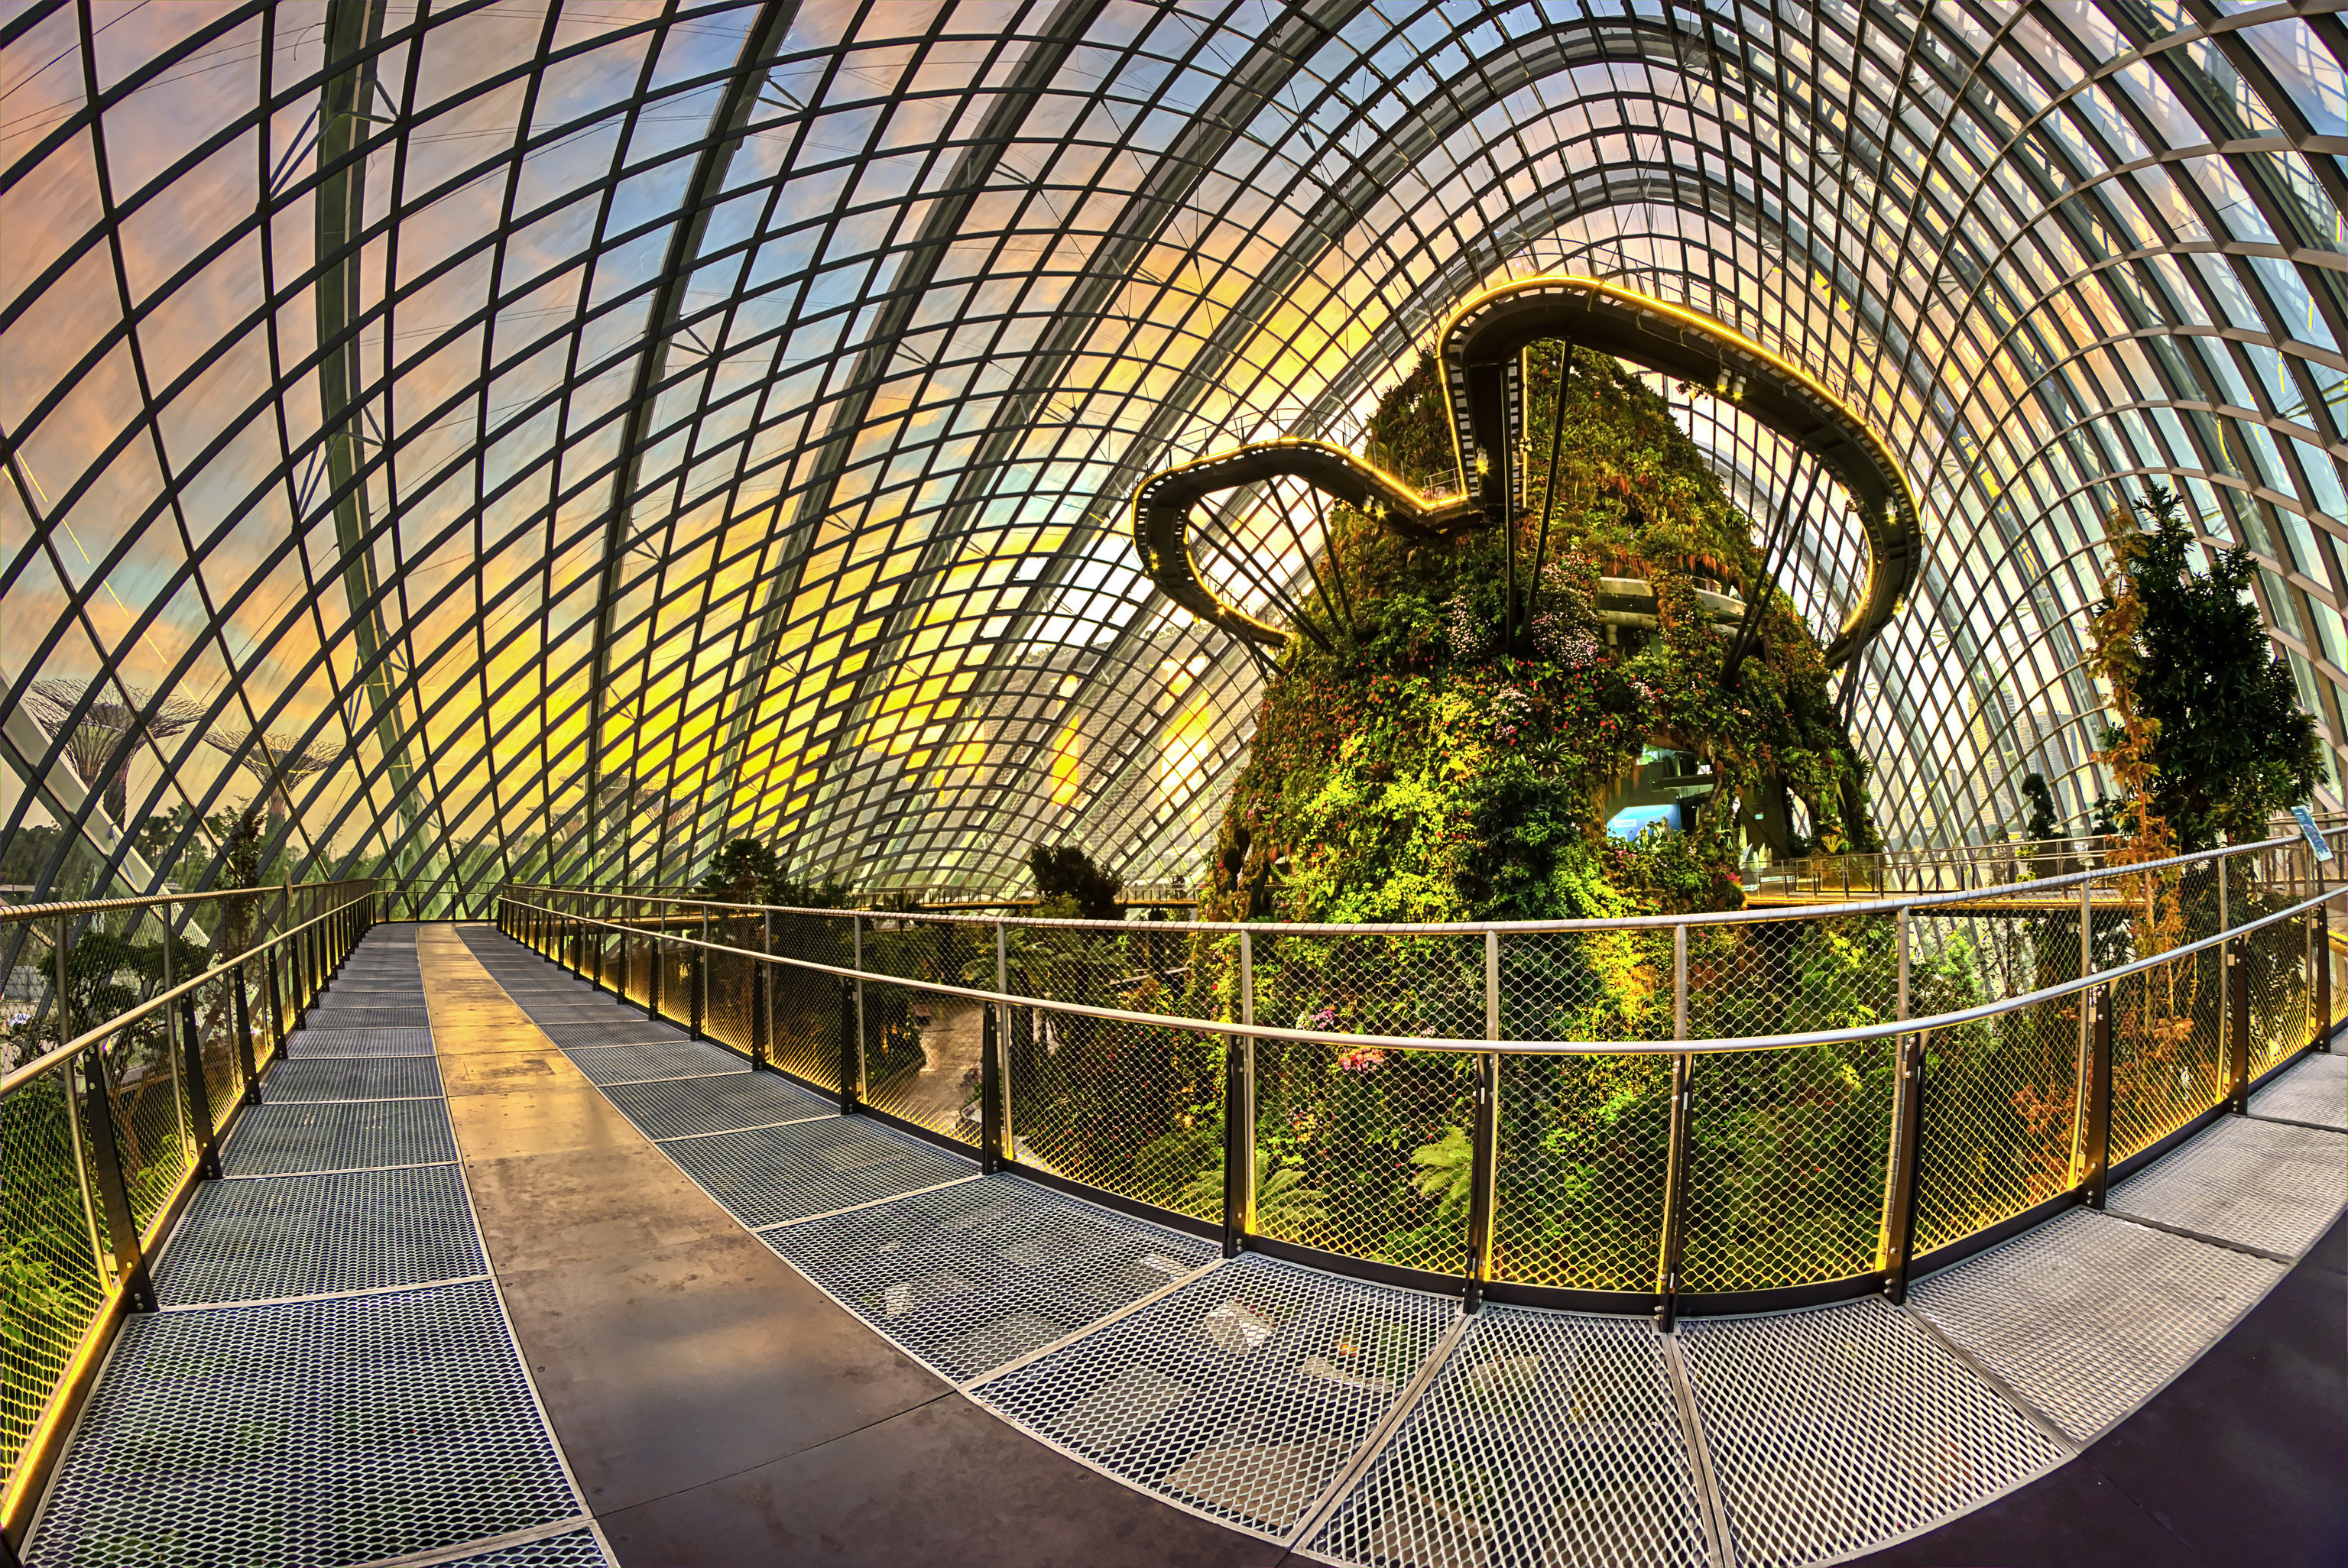 Offbeat Singapore Trip Ideas platform building metal rail urban area Architecture symmetry arch stair net subway railing walkway